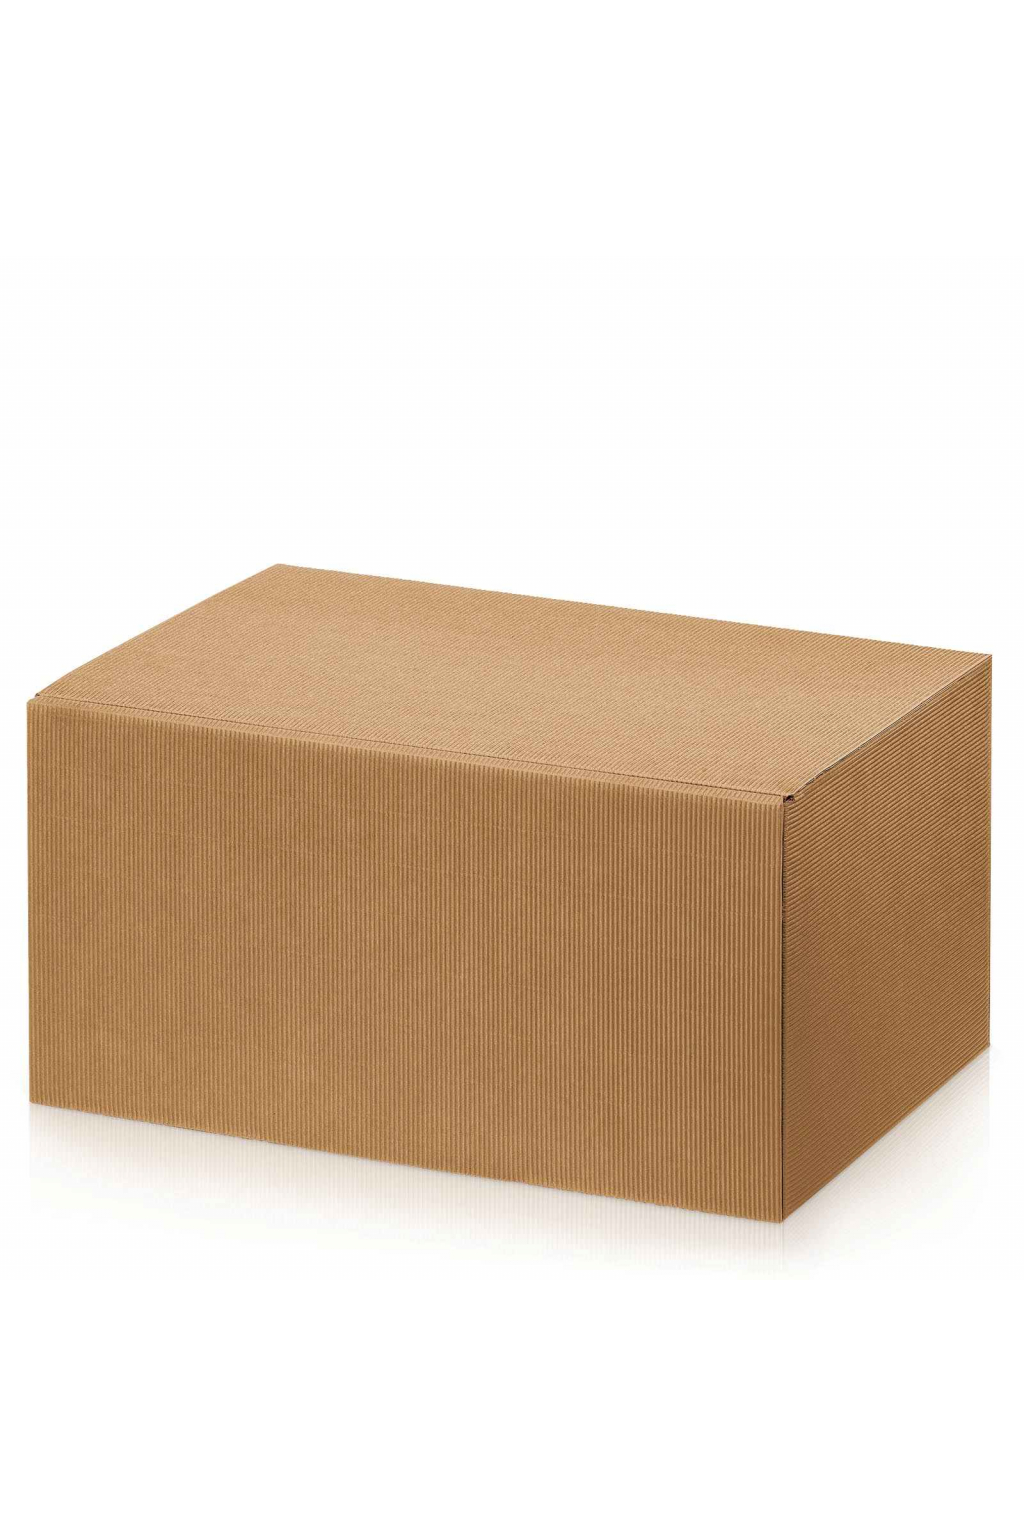 krabicka prirodni 6 lahvi web